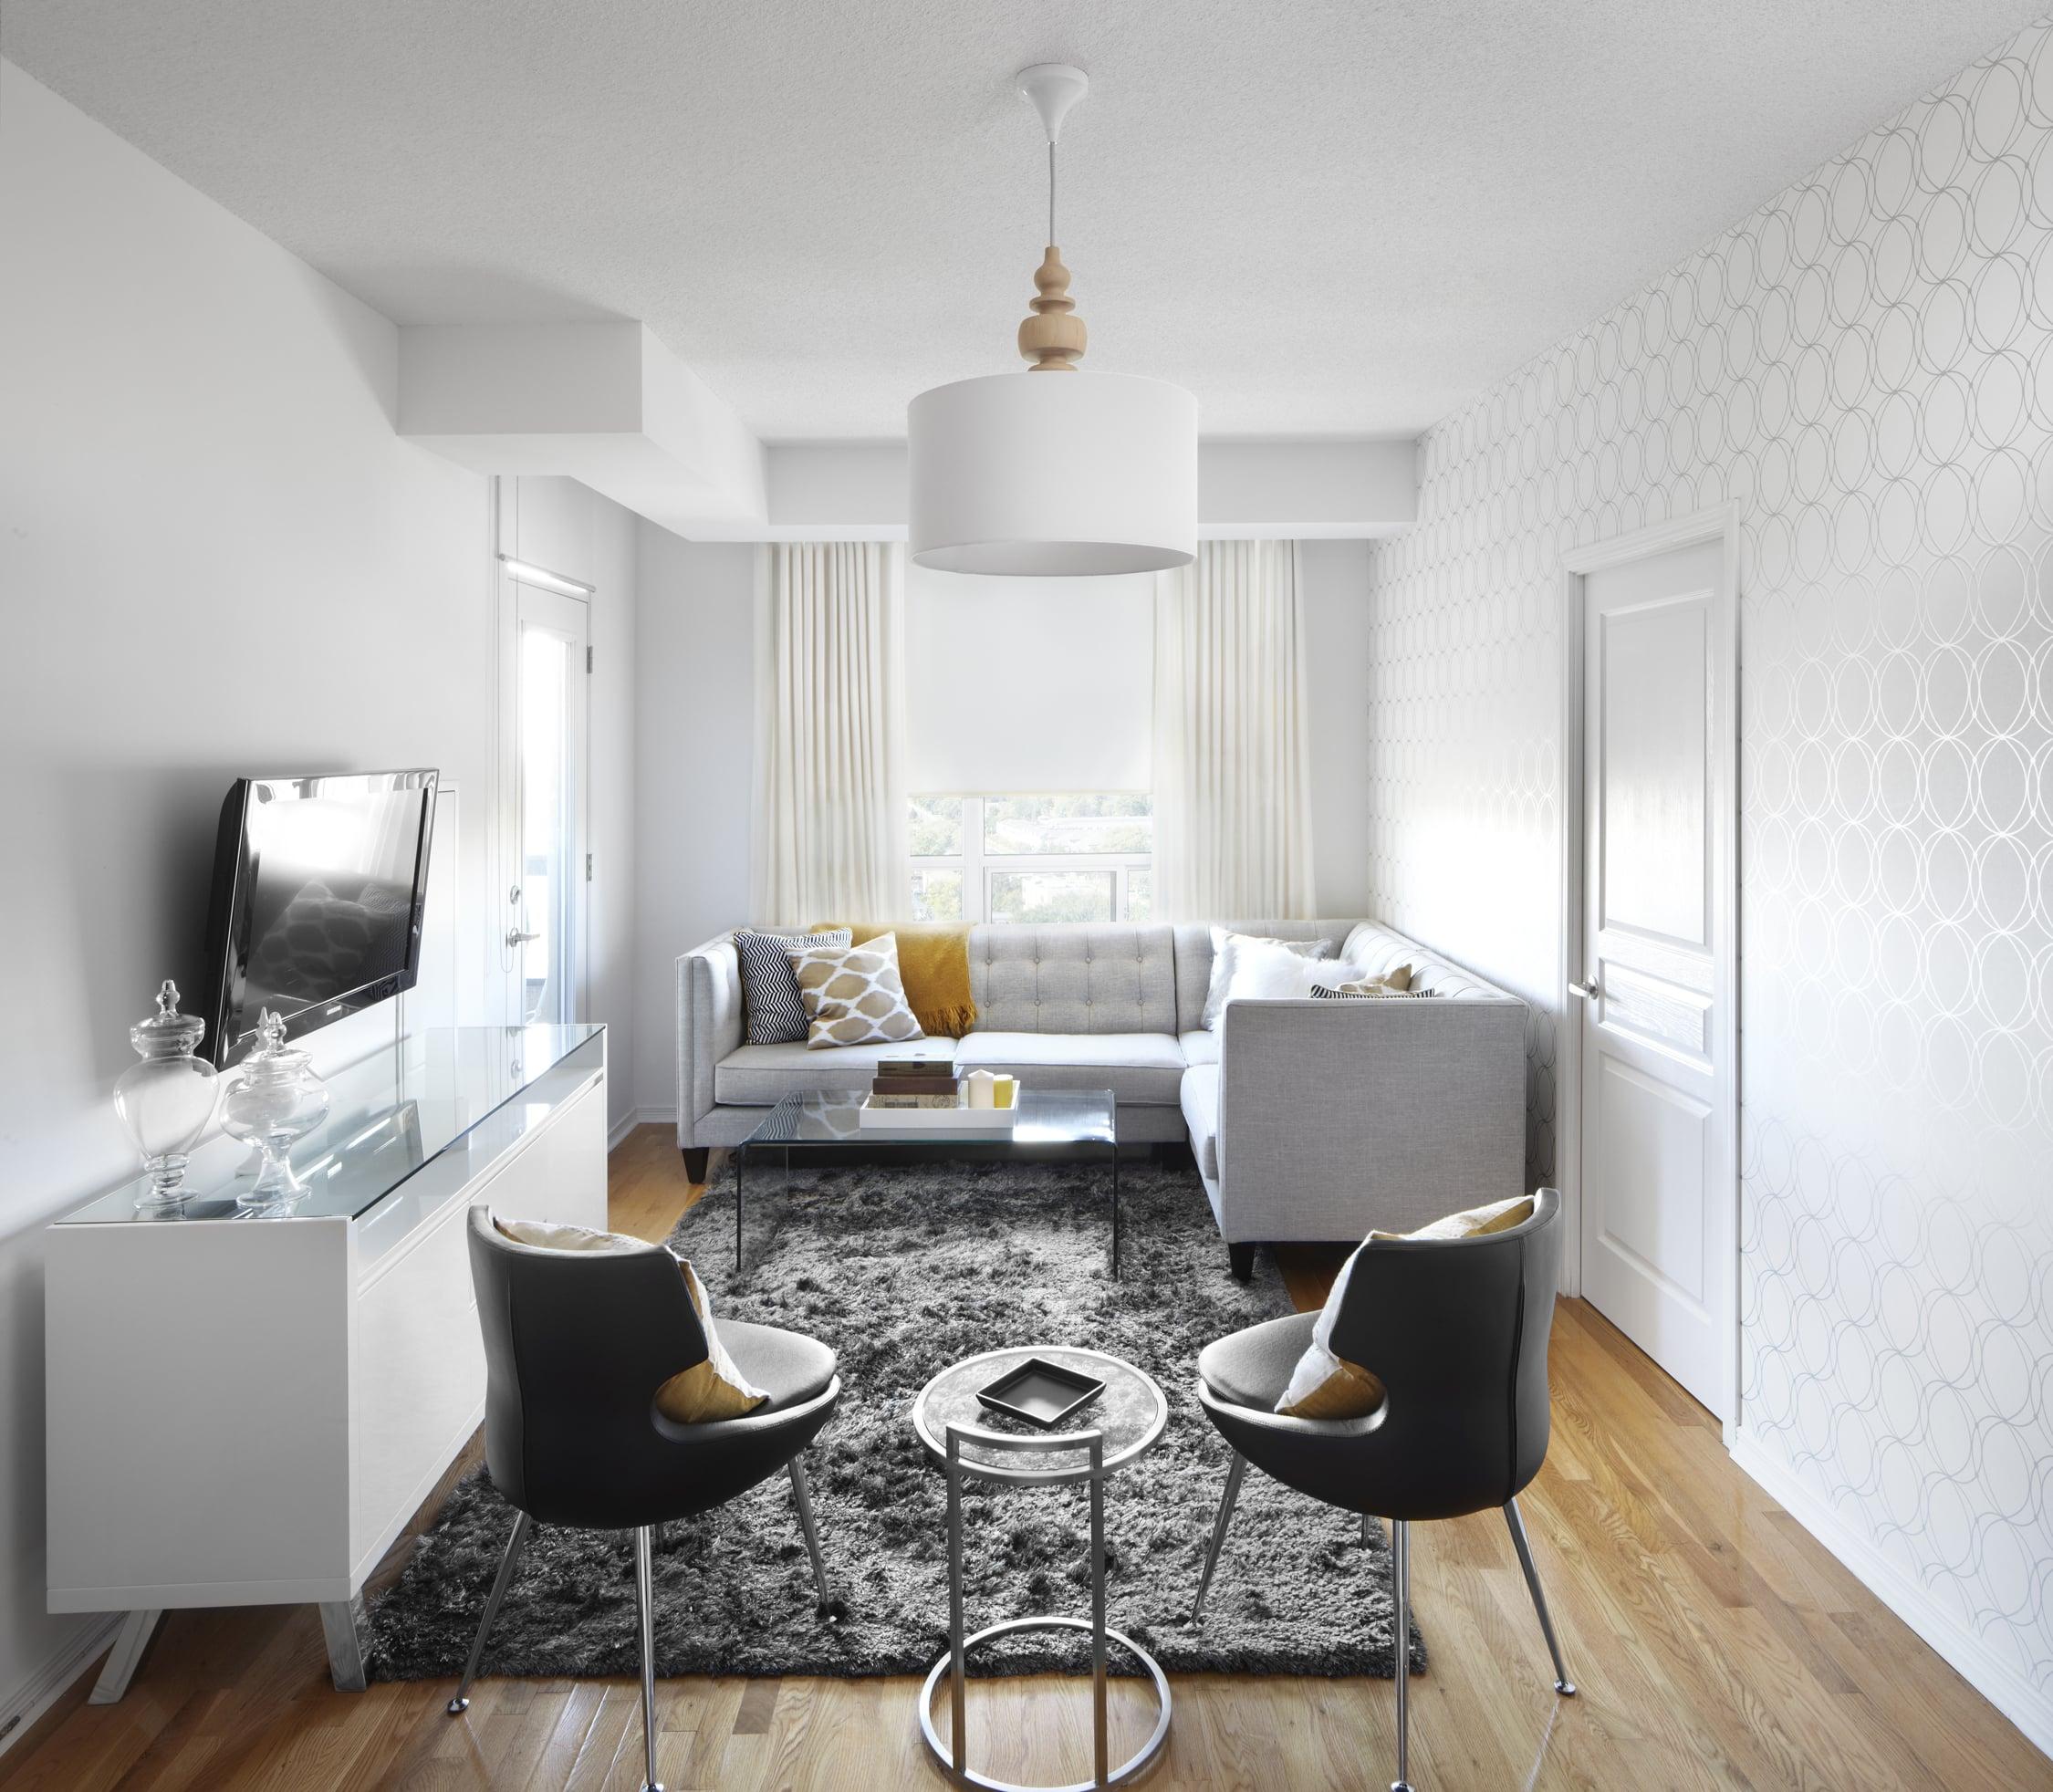 Delta toronto best interior designers top champalimaud for Interior decorating firms